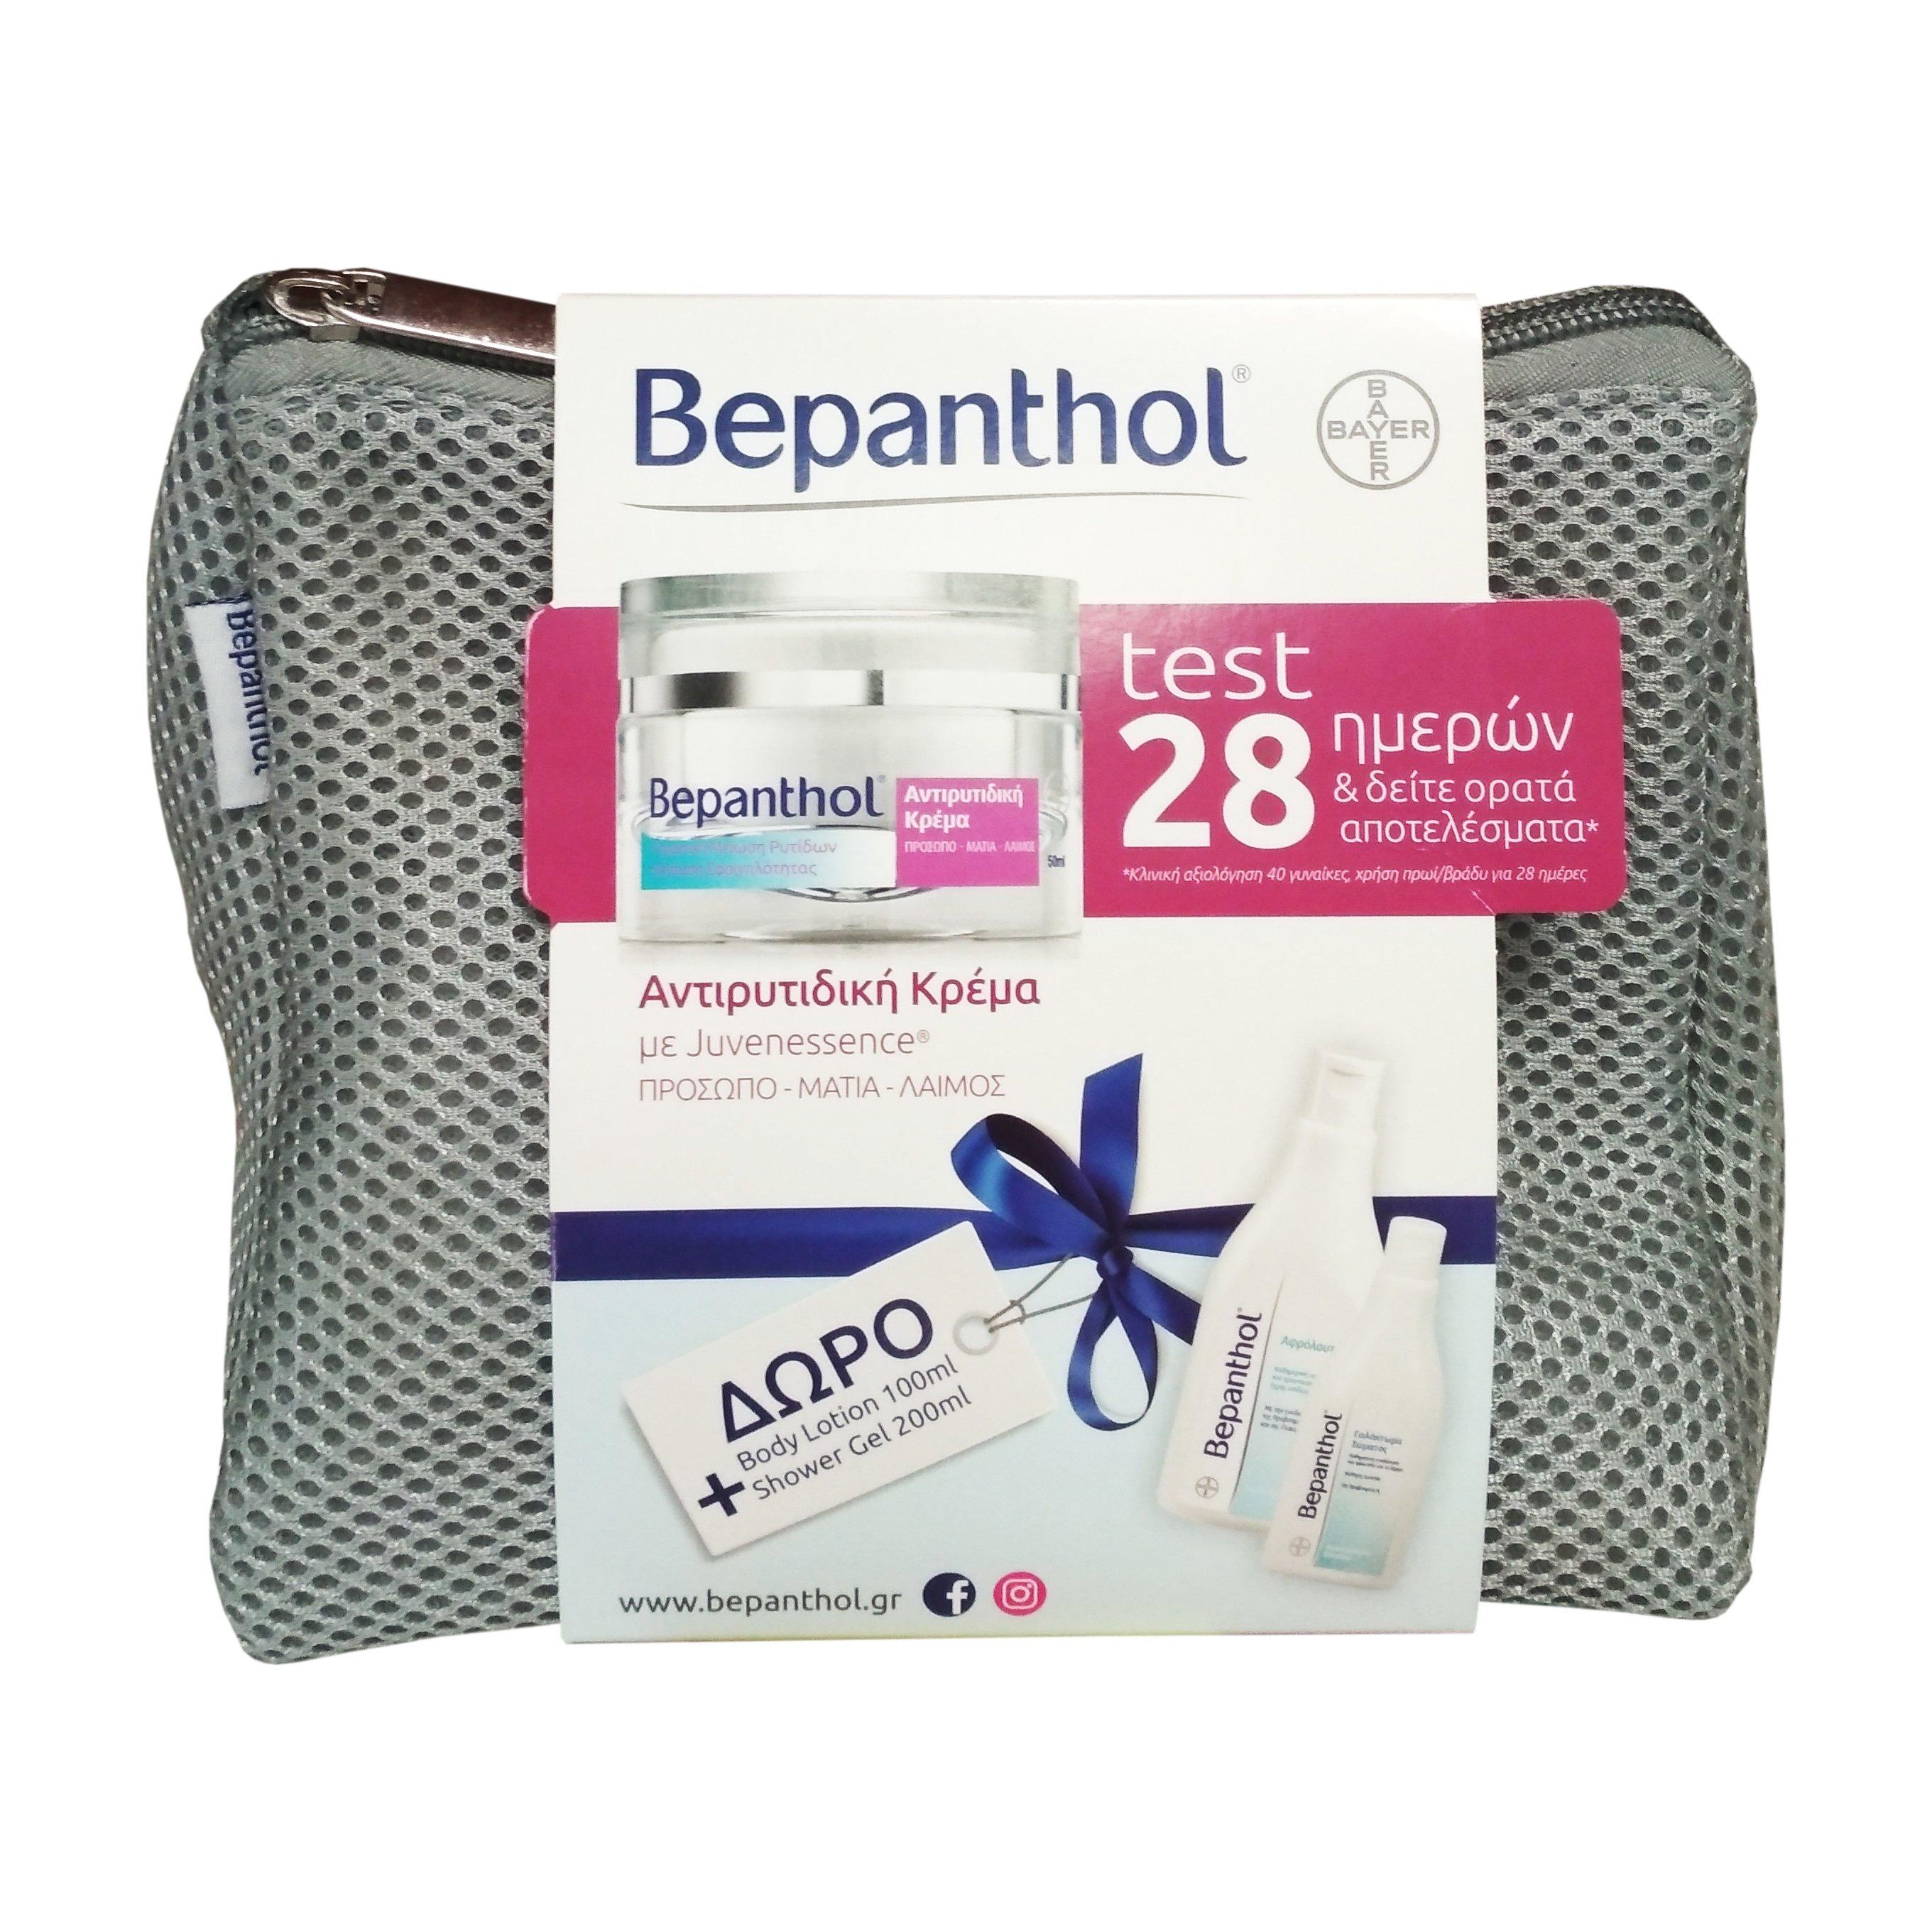 Bepanthol Πακέτο Προσφοράς Face Cream Αντιρυτιδική Κρέμα 50ml & Δώρο Αφρόλουτρο 200ml & Γαλάκτωμα Σώματος 100ml & Τσαντάκι